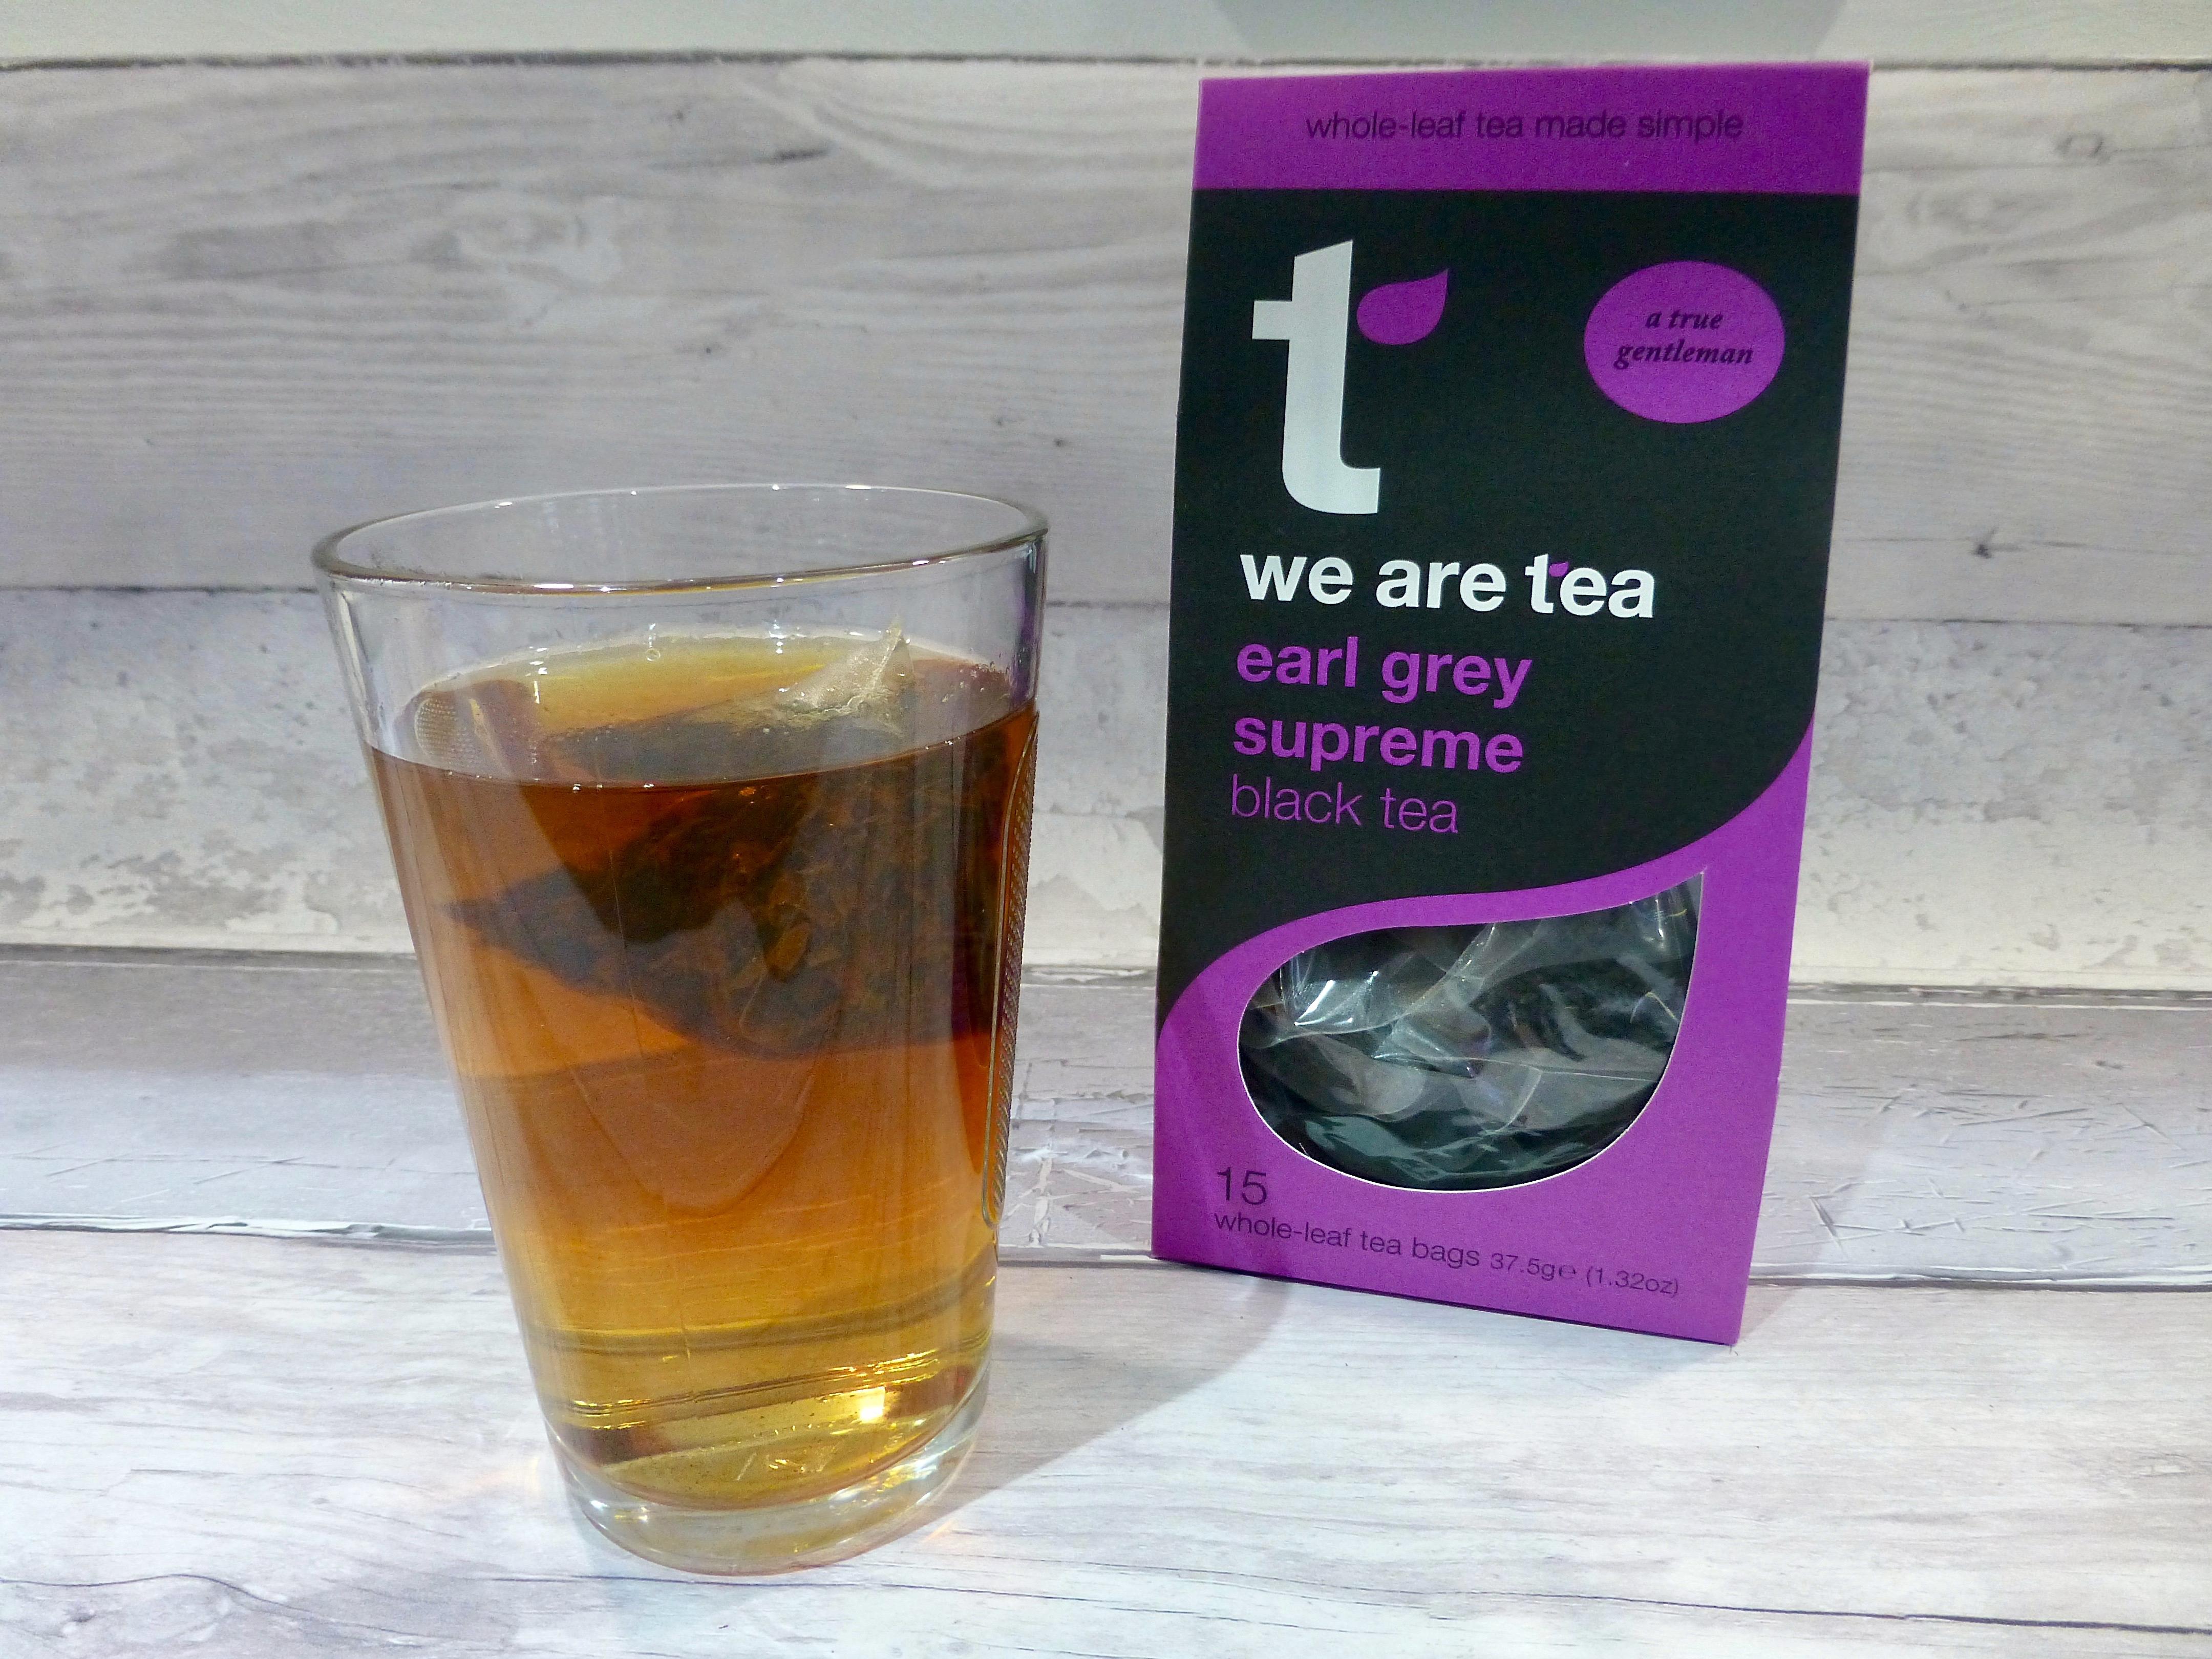 We Are Tea Earl Grey Supreme Black Tea